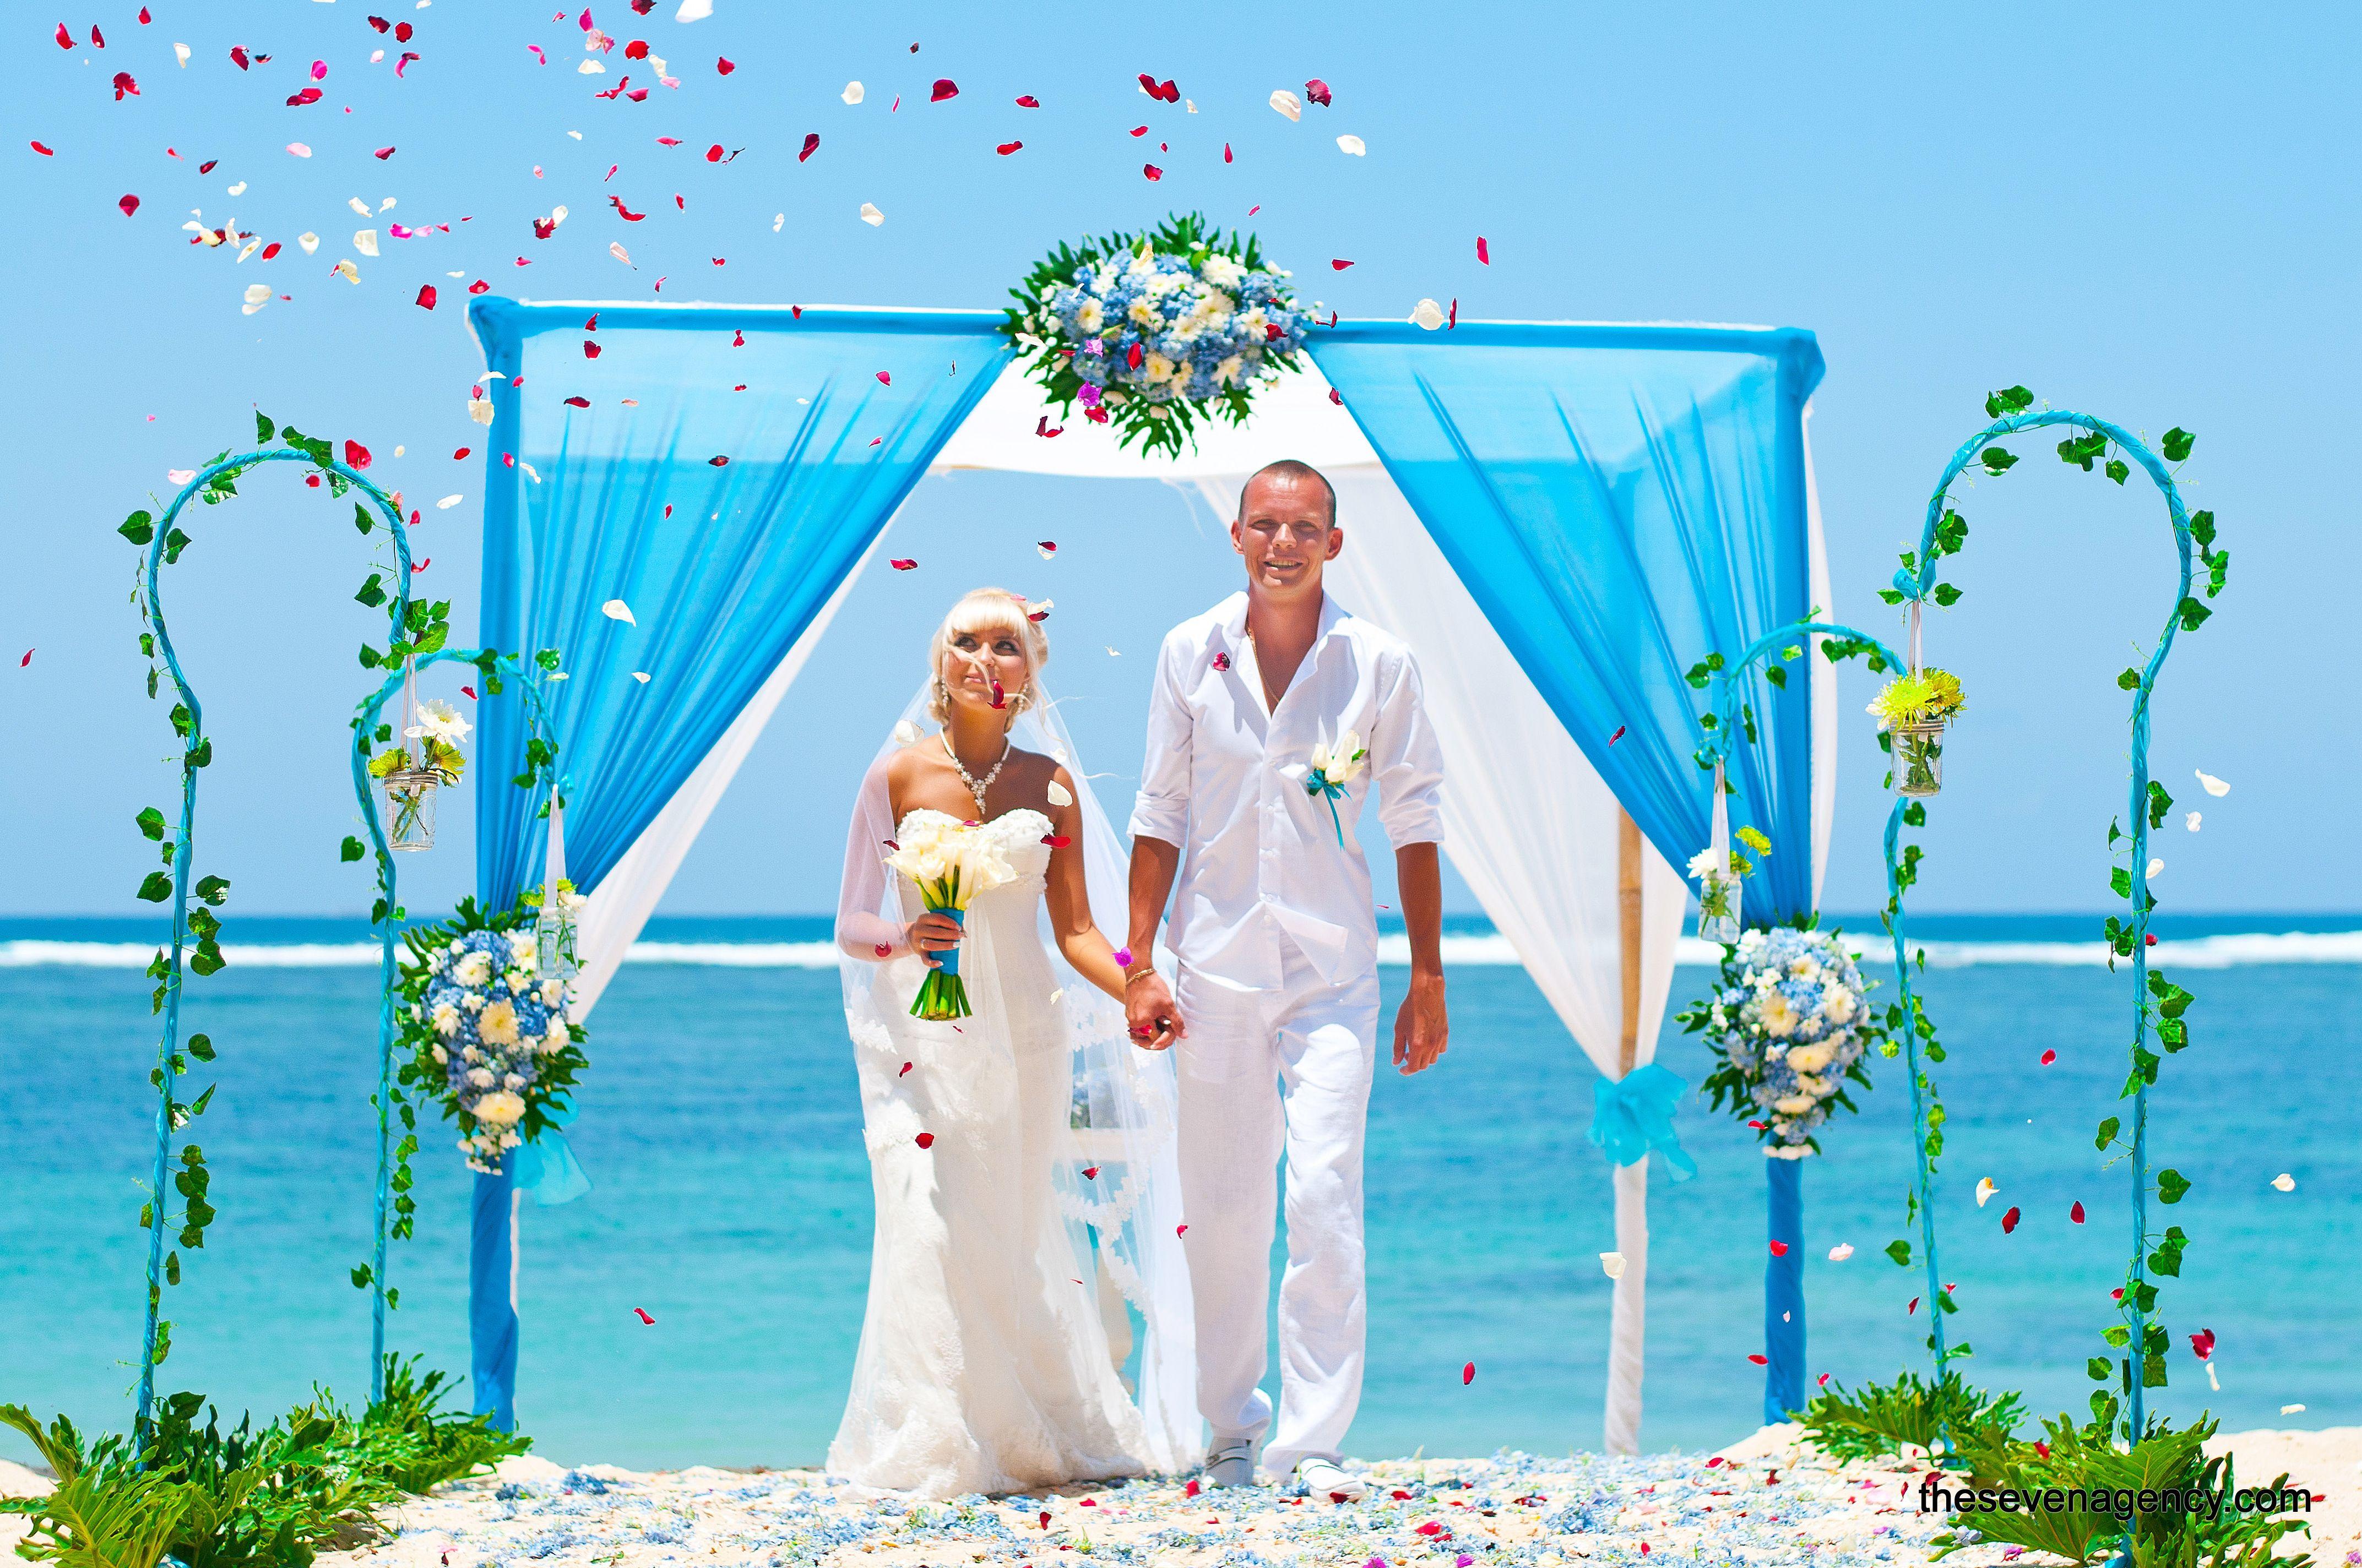 Bali beach luxe wedding Bali wedding, Wedding, Bali beaches